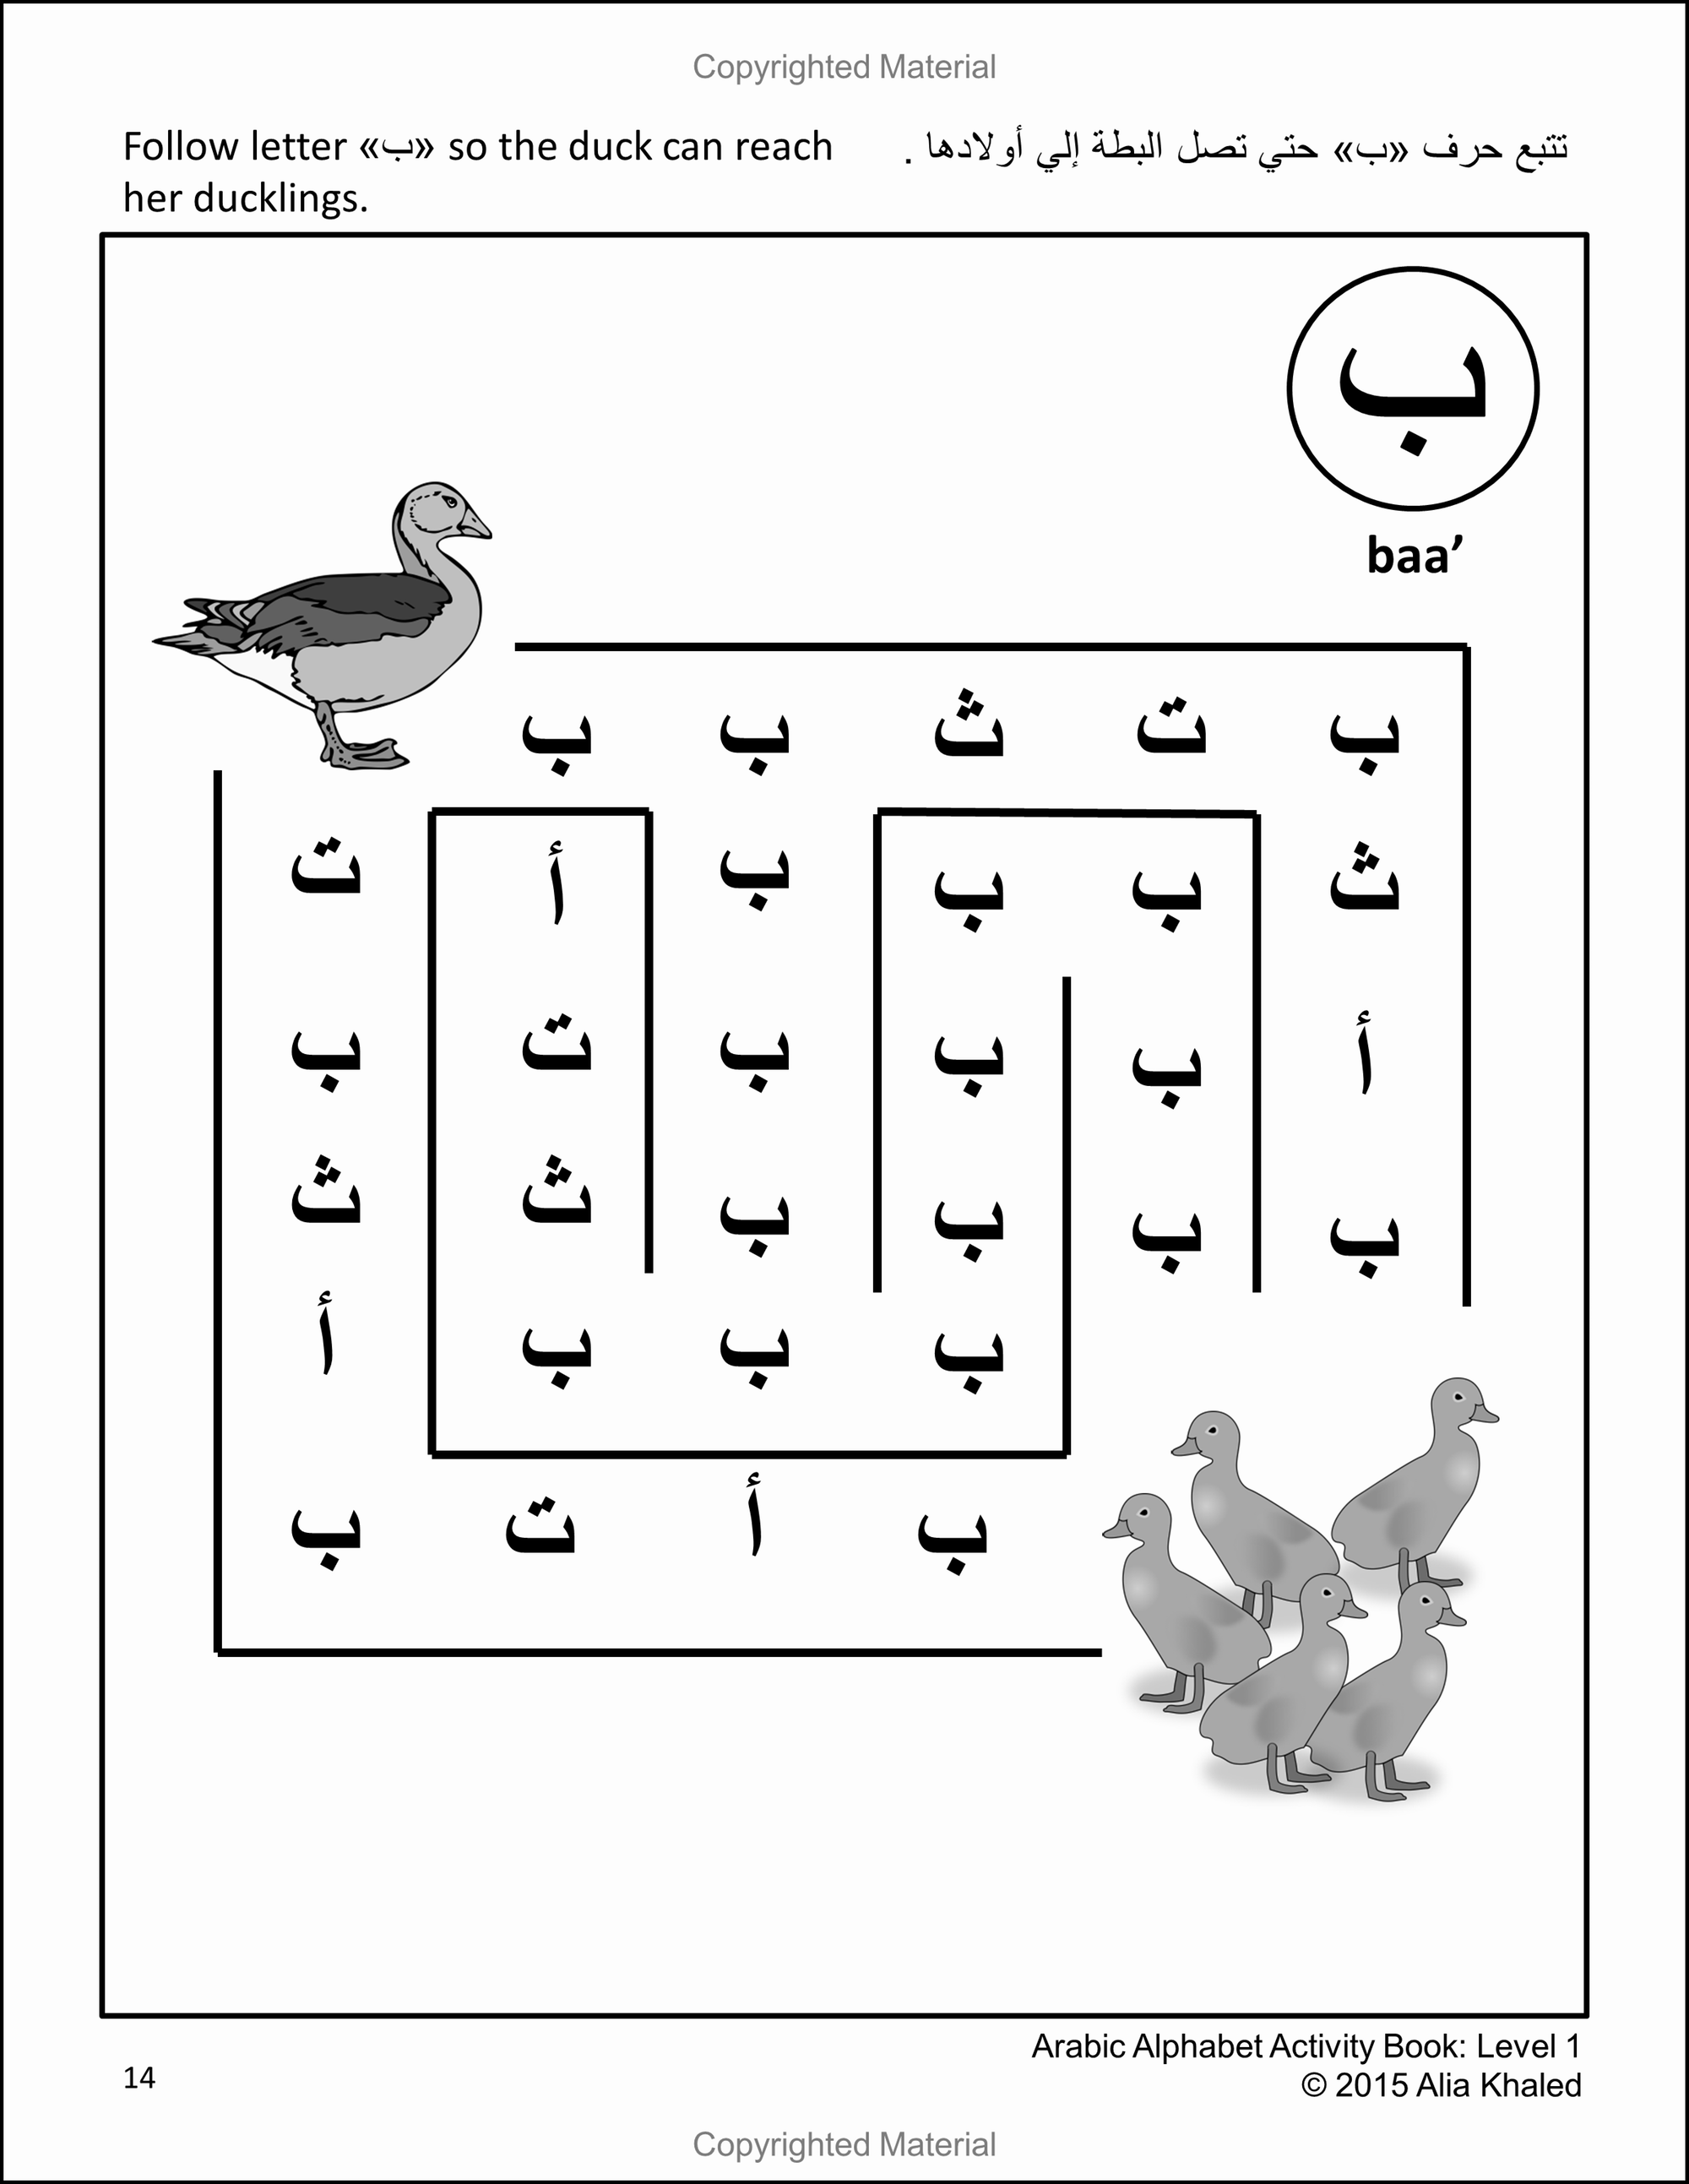 Arabic Alphabet Activity Book: Level 1 (Black/white Edition with Alphabet Tracing Level 1